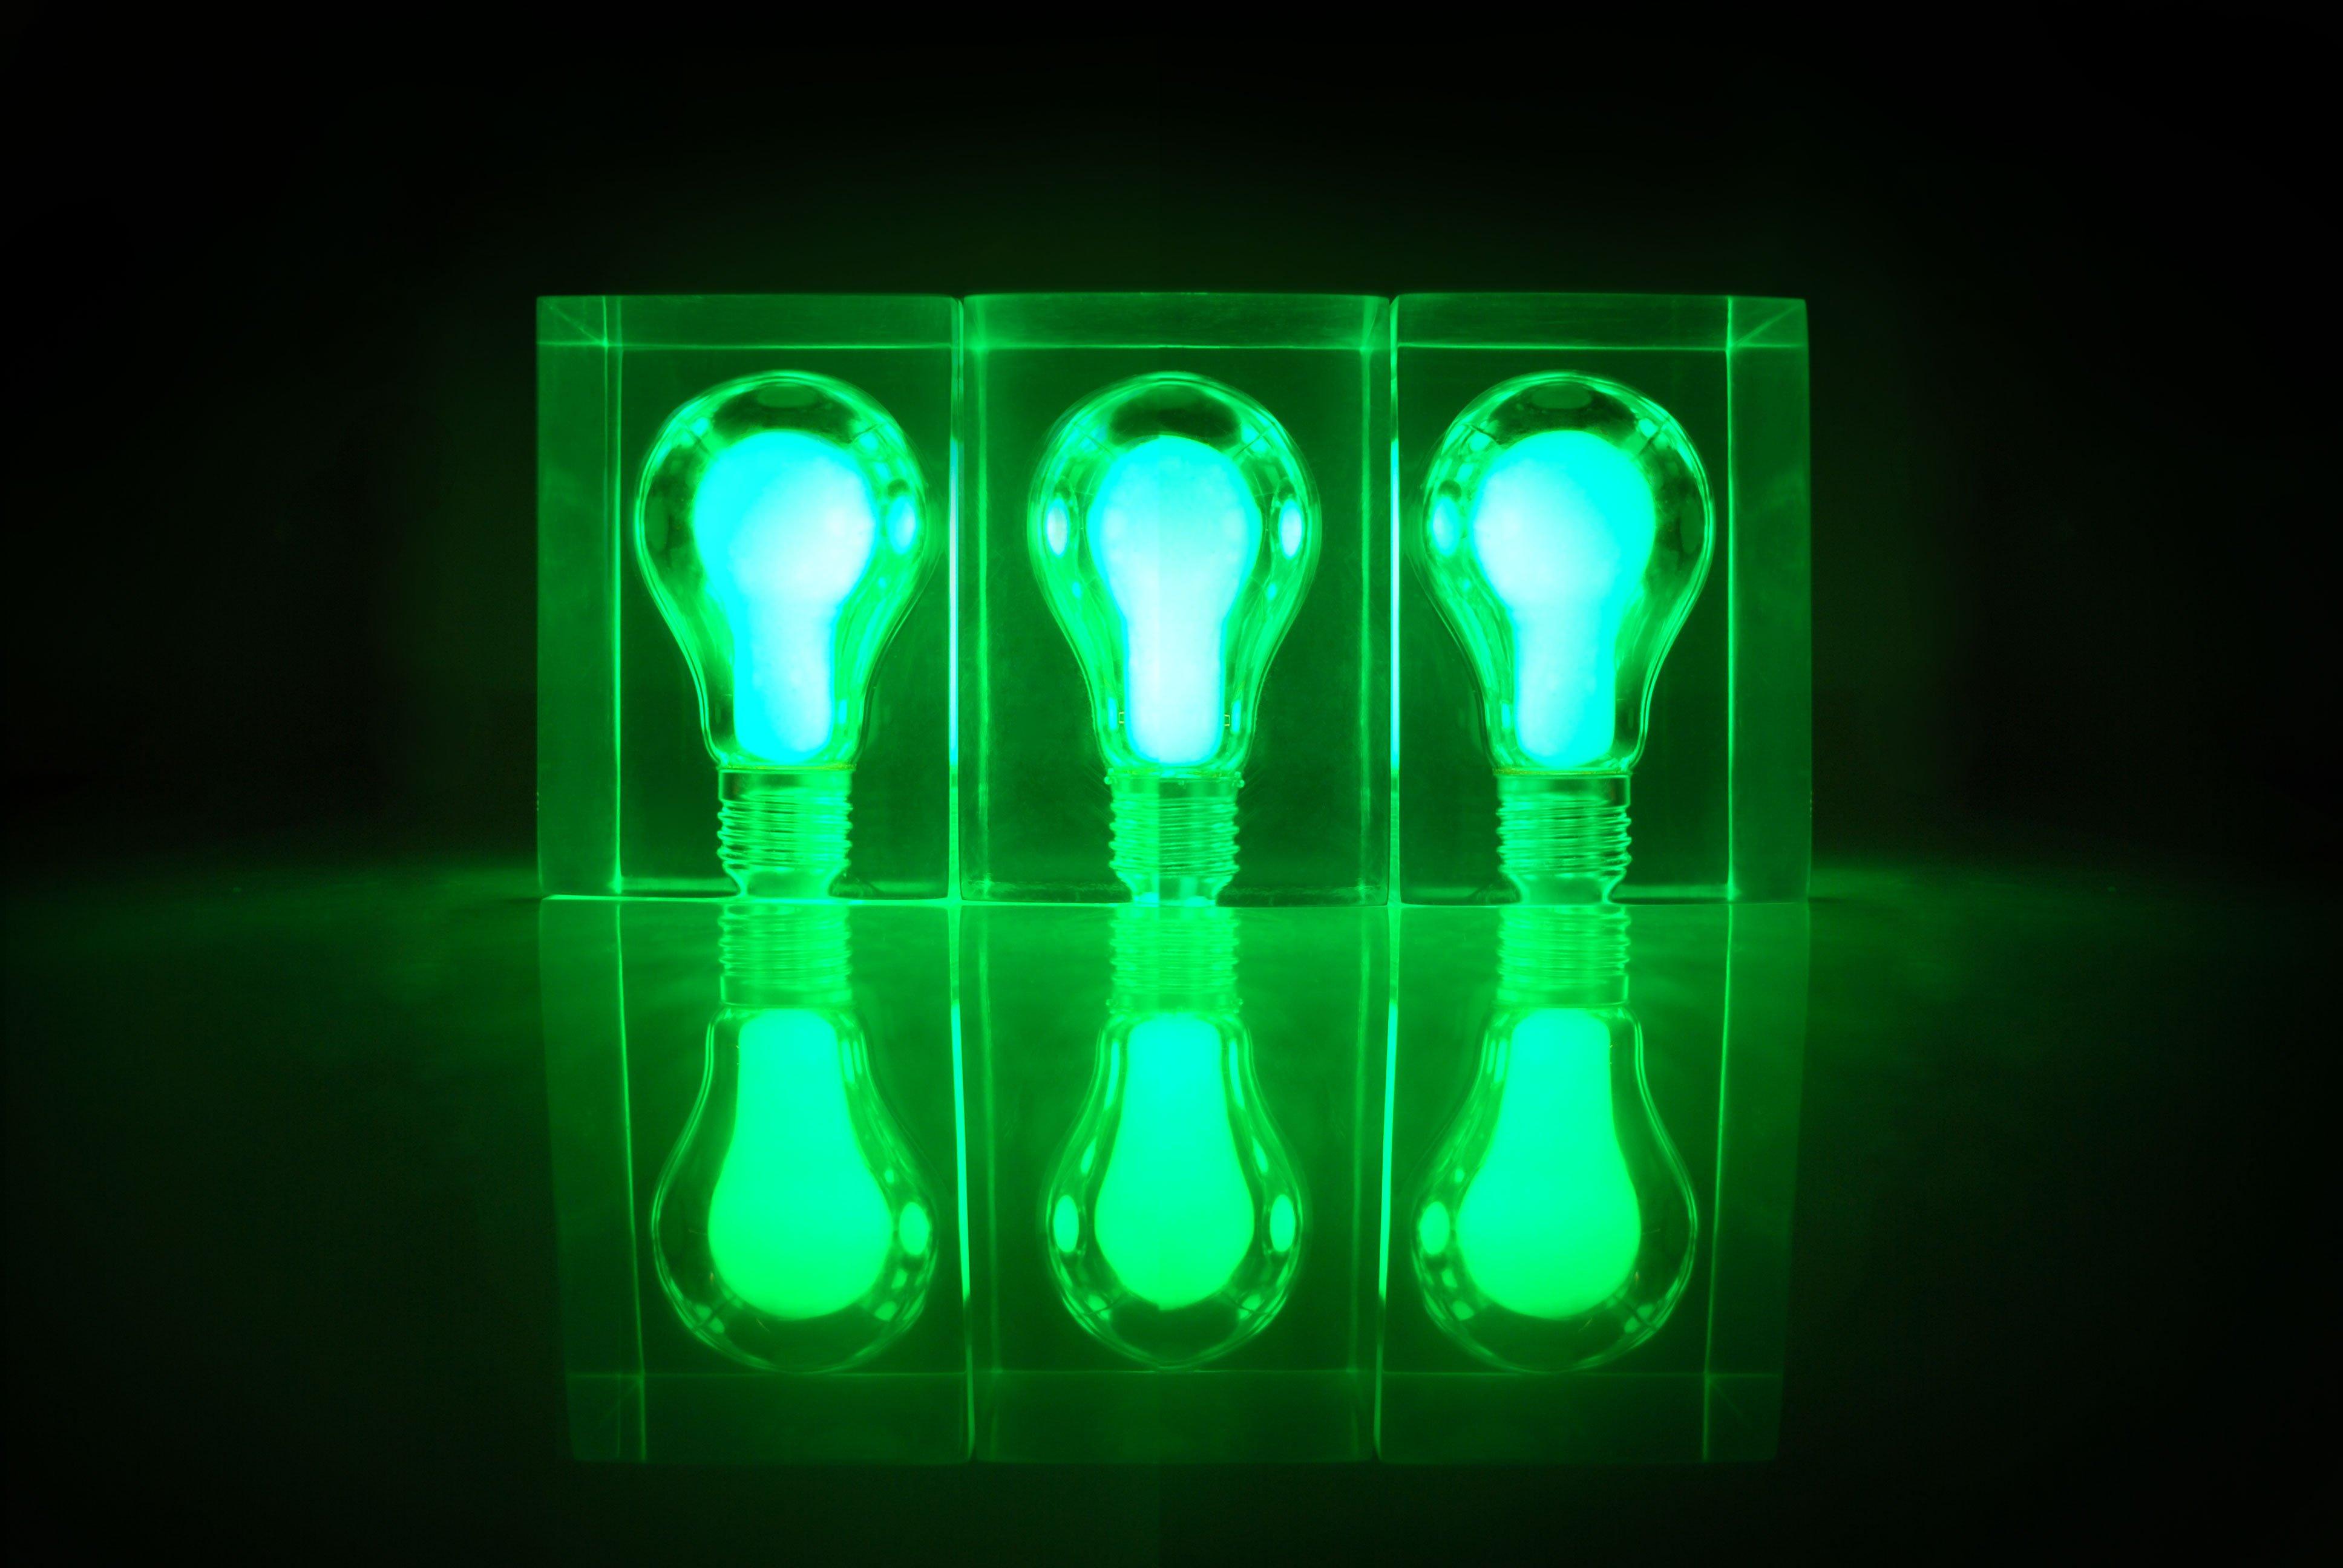 glow brick content gallery glow in the dark light bulb night light. Black Bedroom Furniture Sets. Home Design Ideas